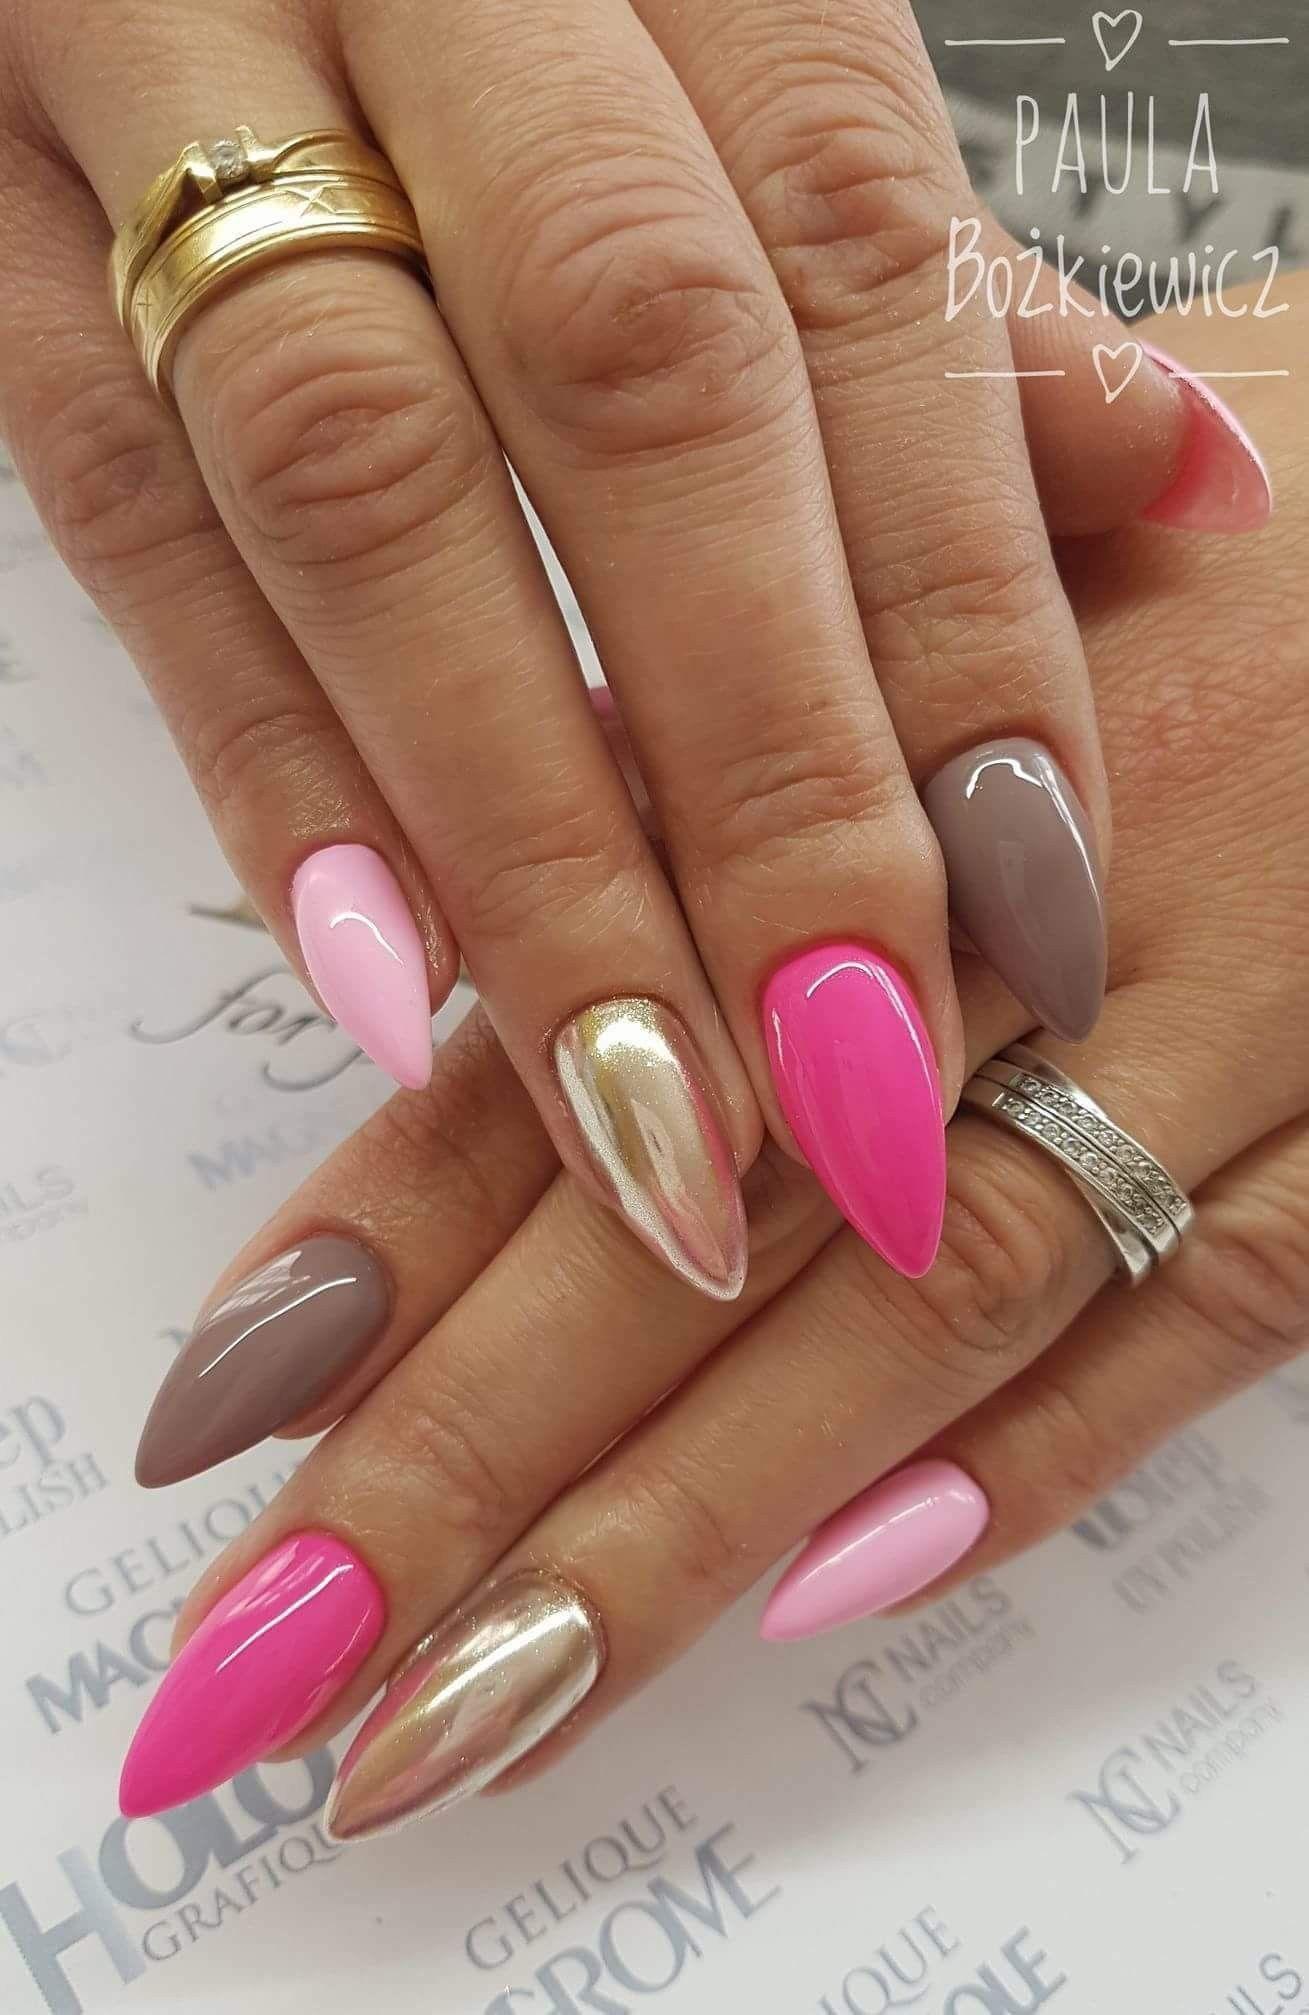 Follow Me Beautyndesign For More Slayin Pins With Images Barevne Nehty Gelove Nehty Design Nehtu